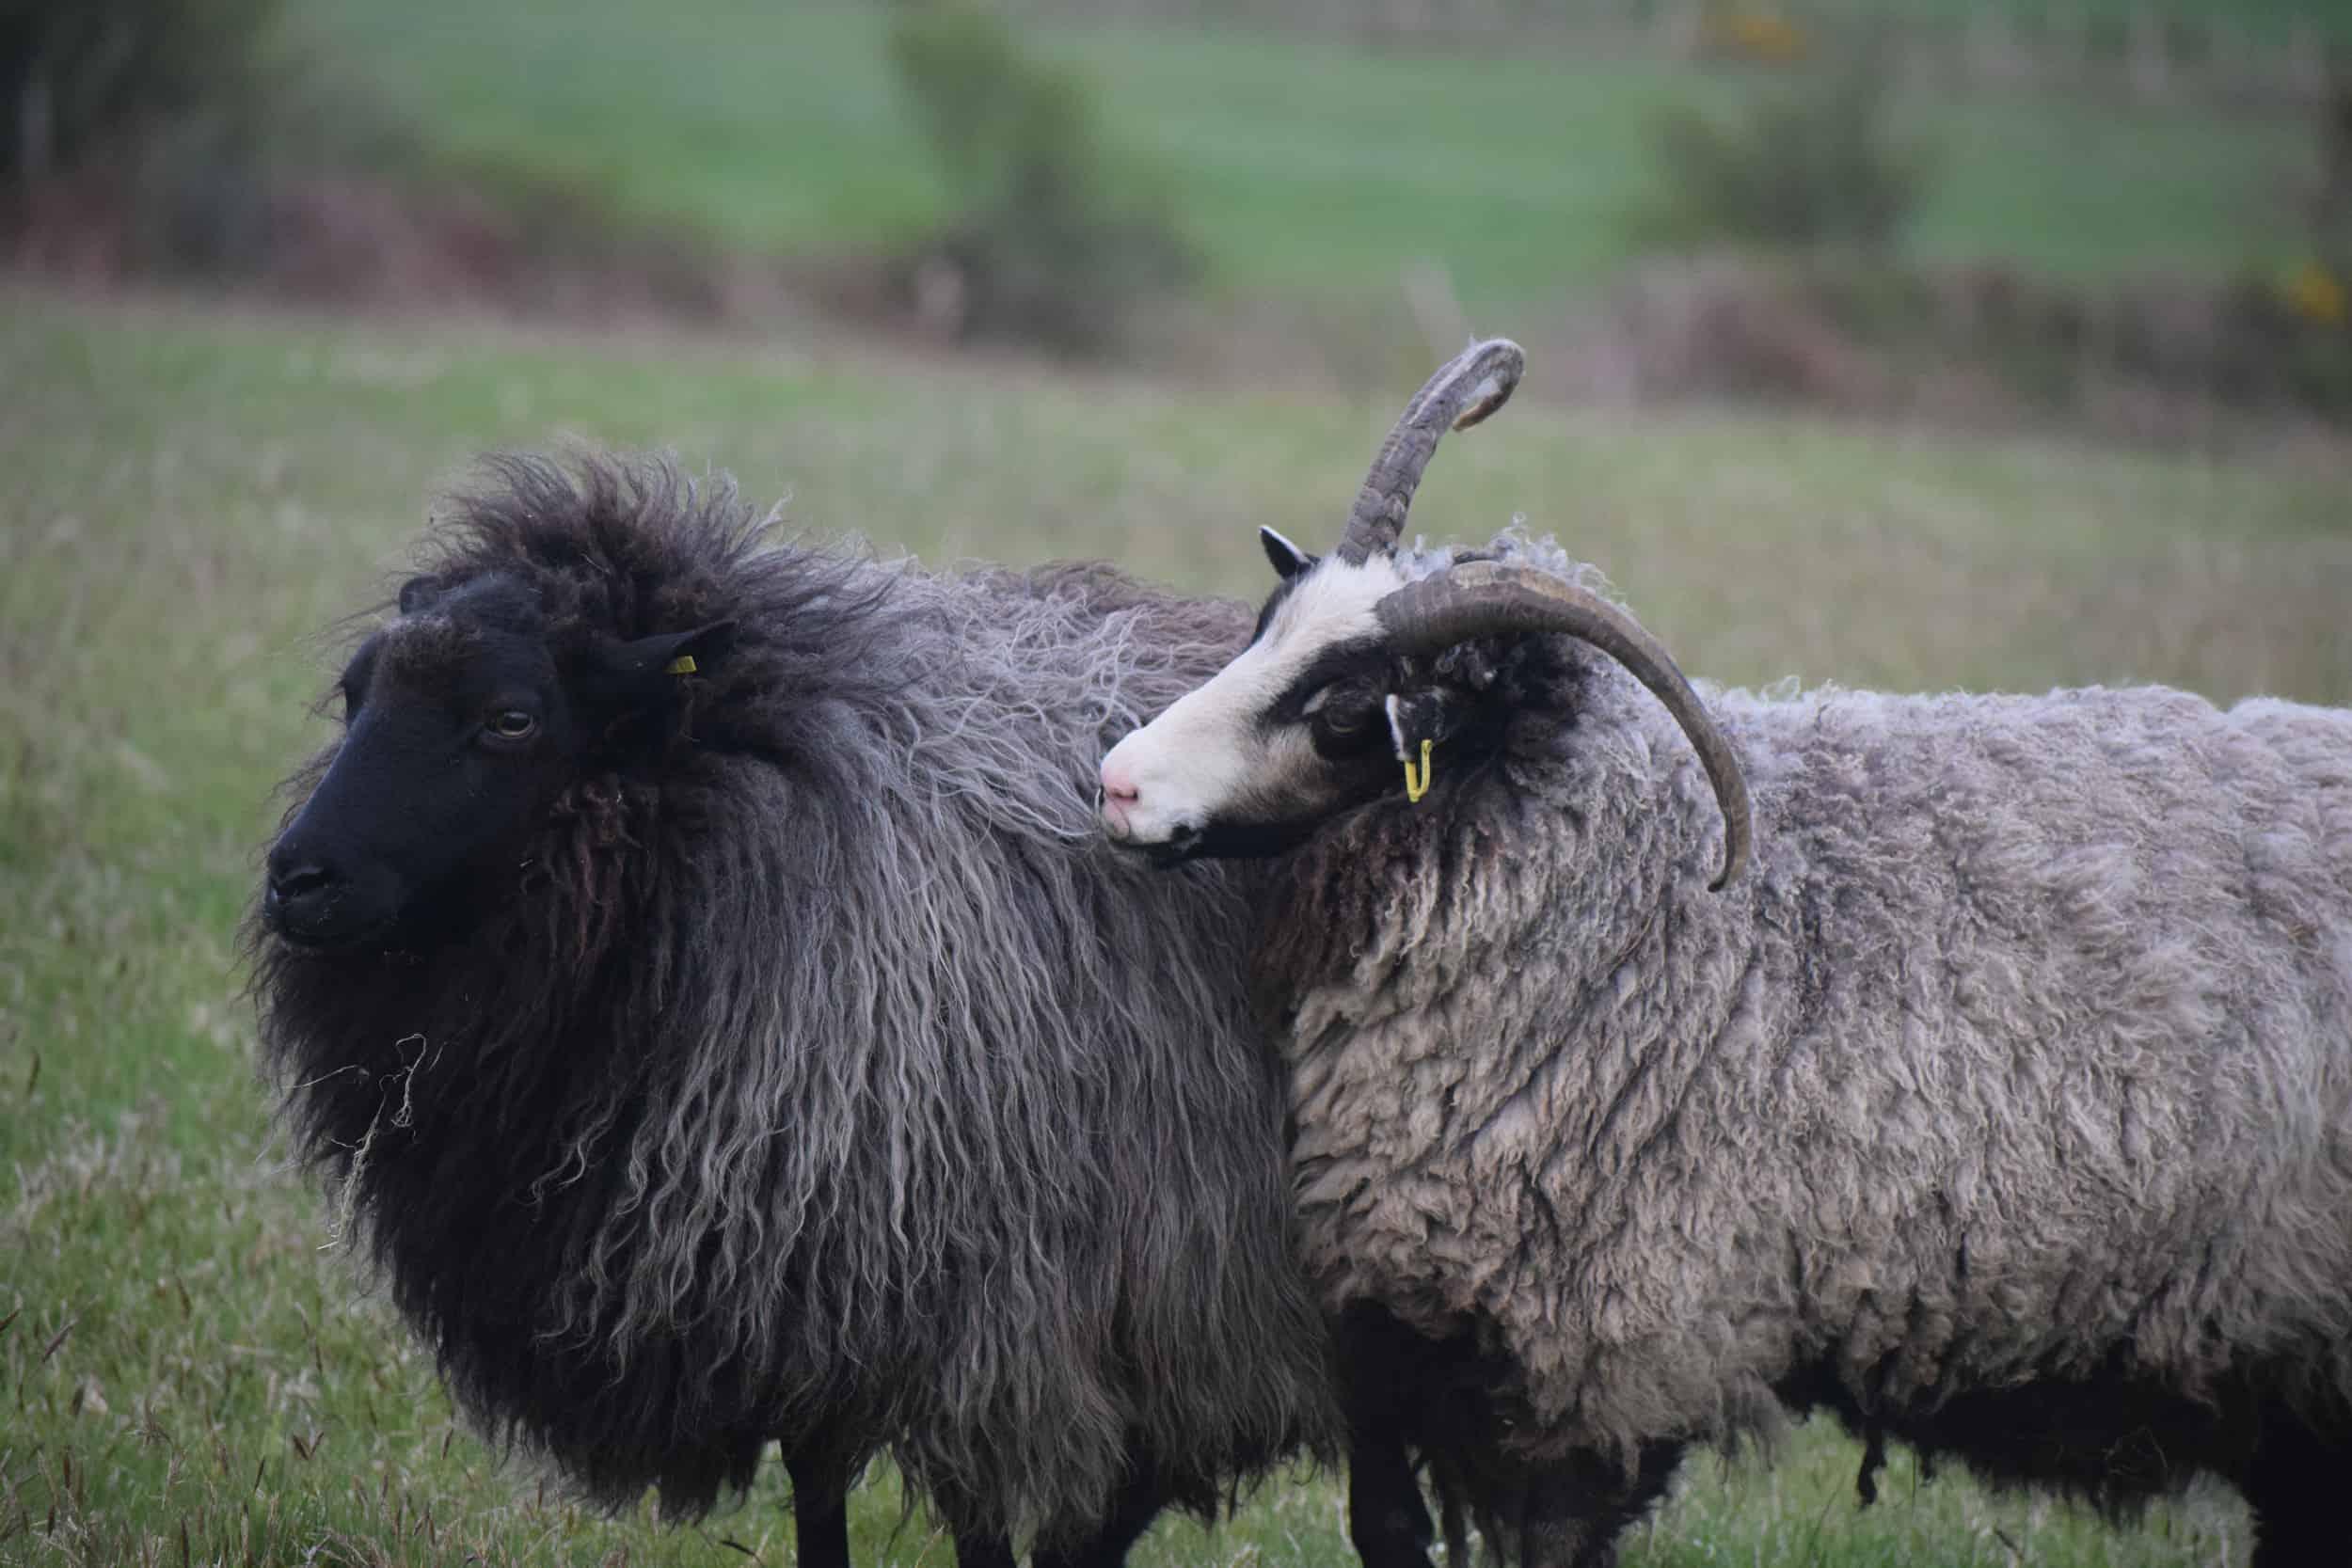 Poppy gem sheep playing katmoget badgerface shetland cross jacob sheep lamb cute